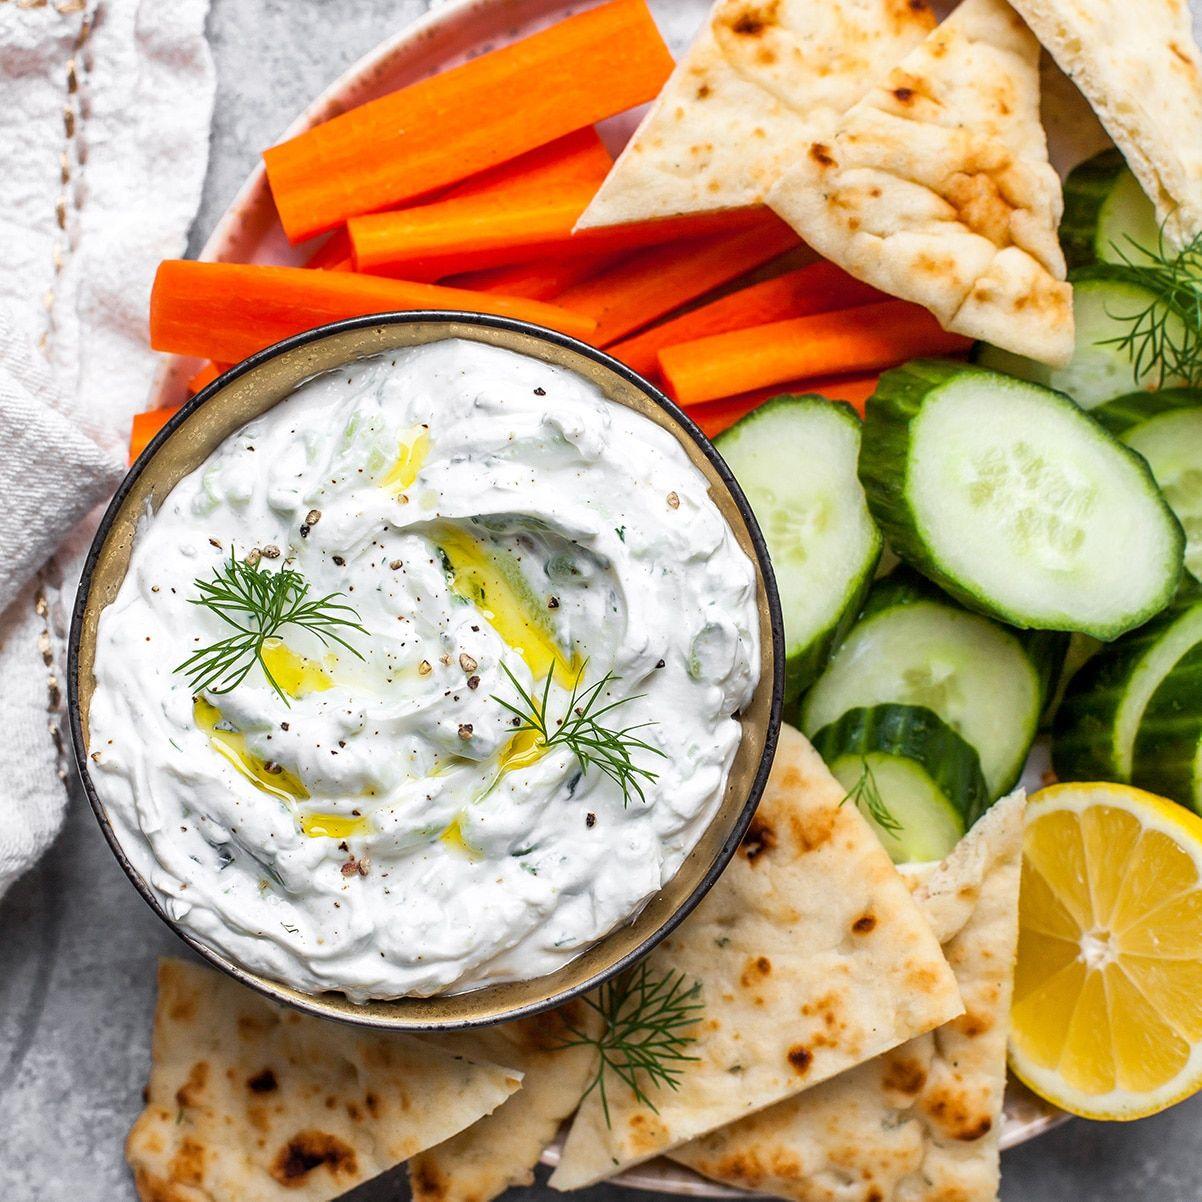 The Best Homemade Tzatziki Sauce Recipe This Easy Tzatziki Sauce Is Made With Greek Yogurt Sour Cream A In 2020 Greek Recipes Homemade Tzatziki Mediterranean Recipes